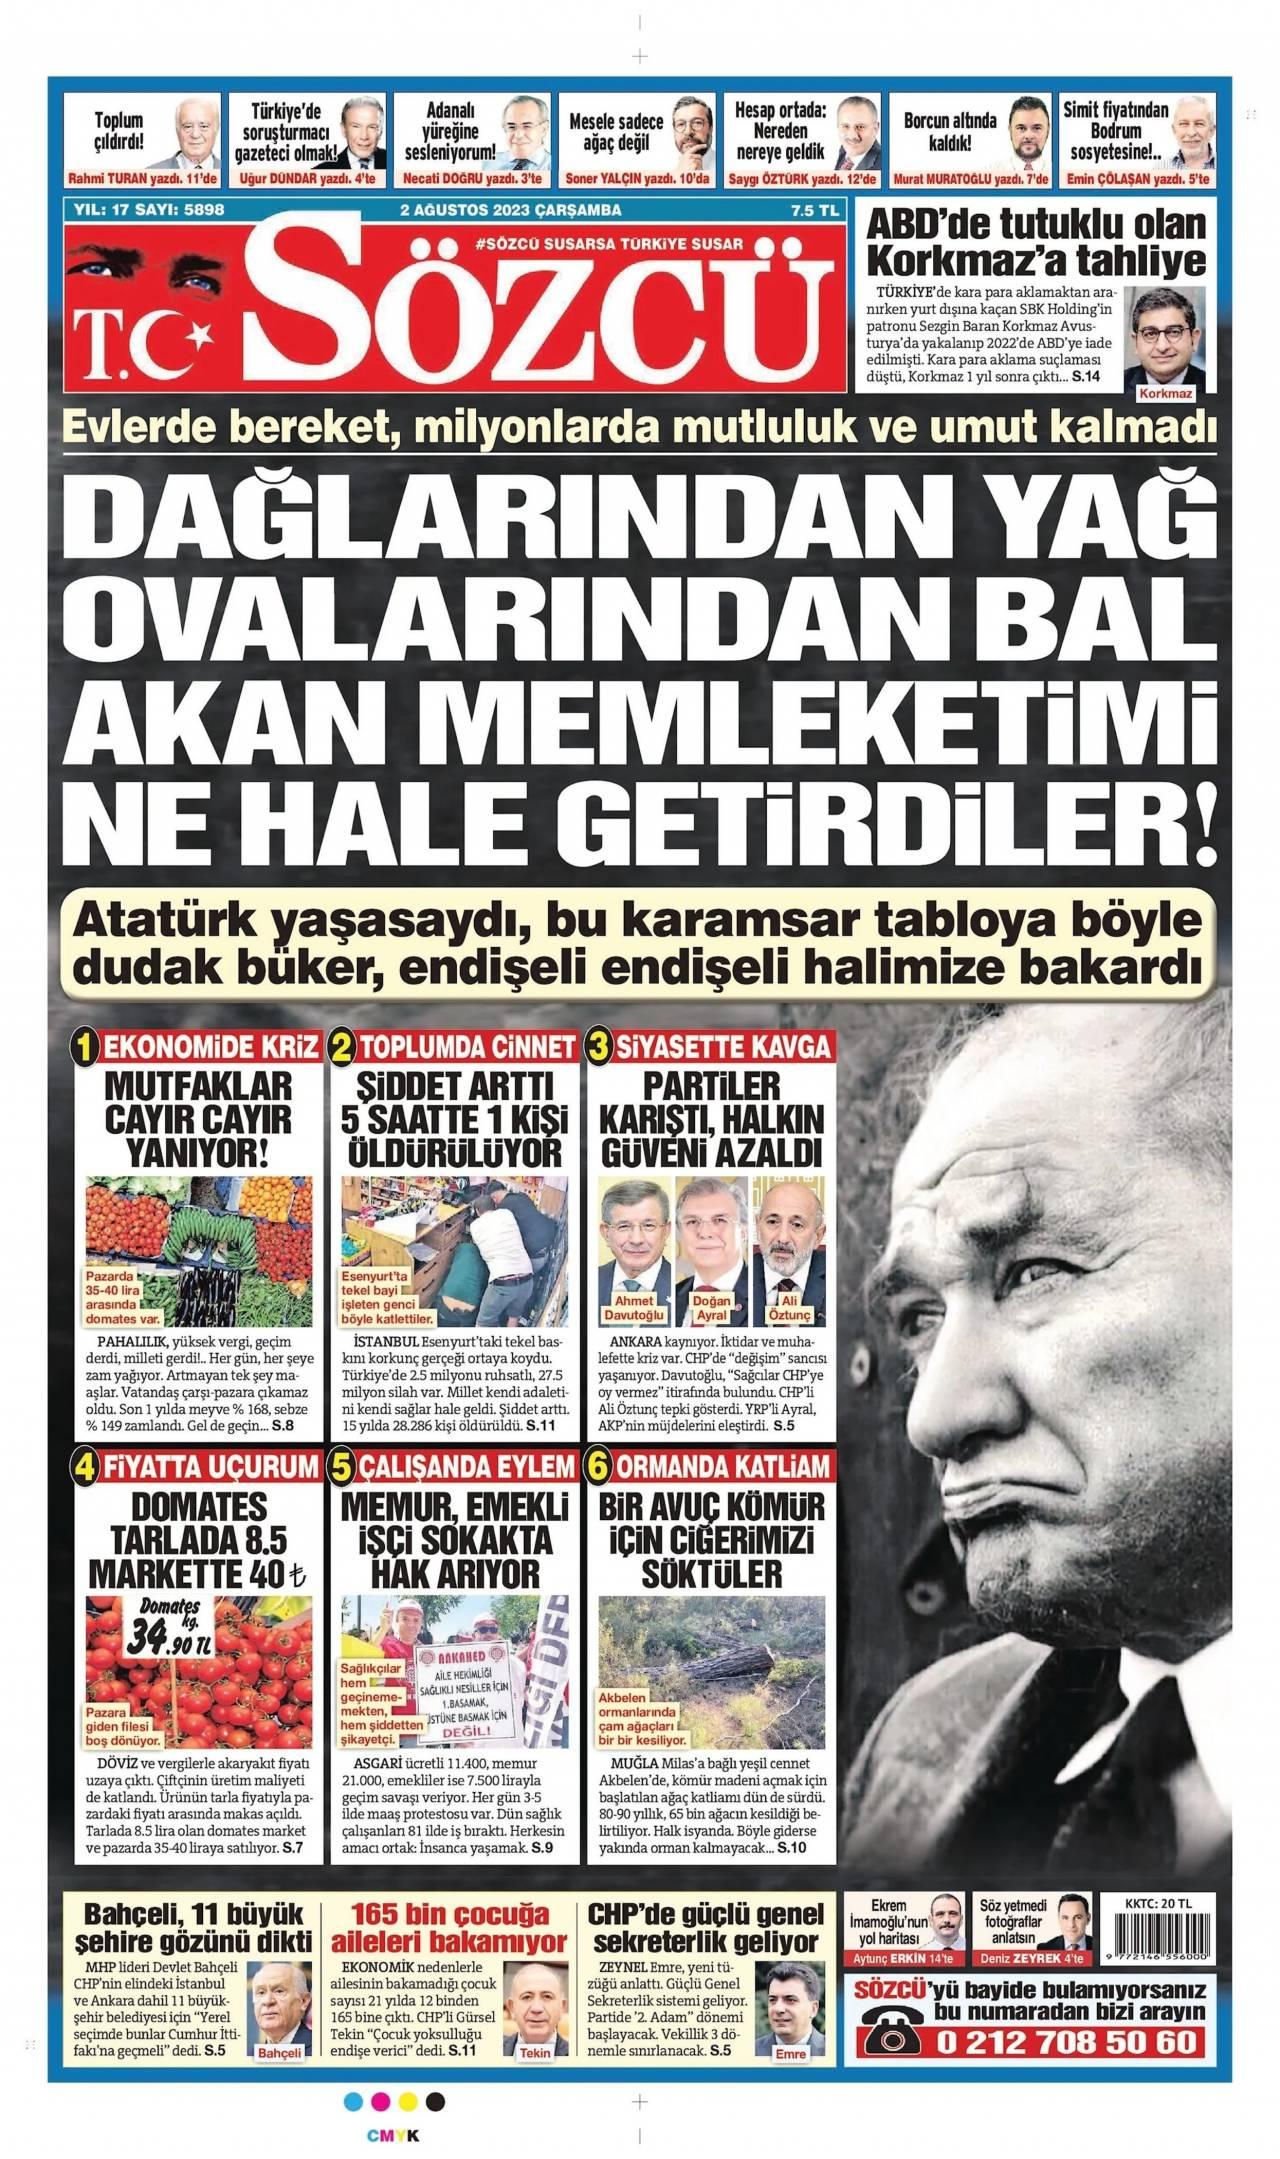 22 Ekim 2019, Salı sozcu Gazetesi